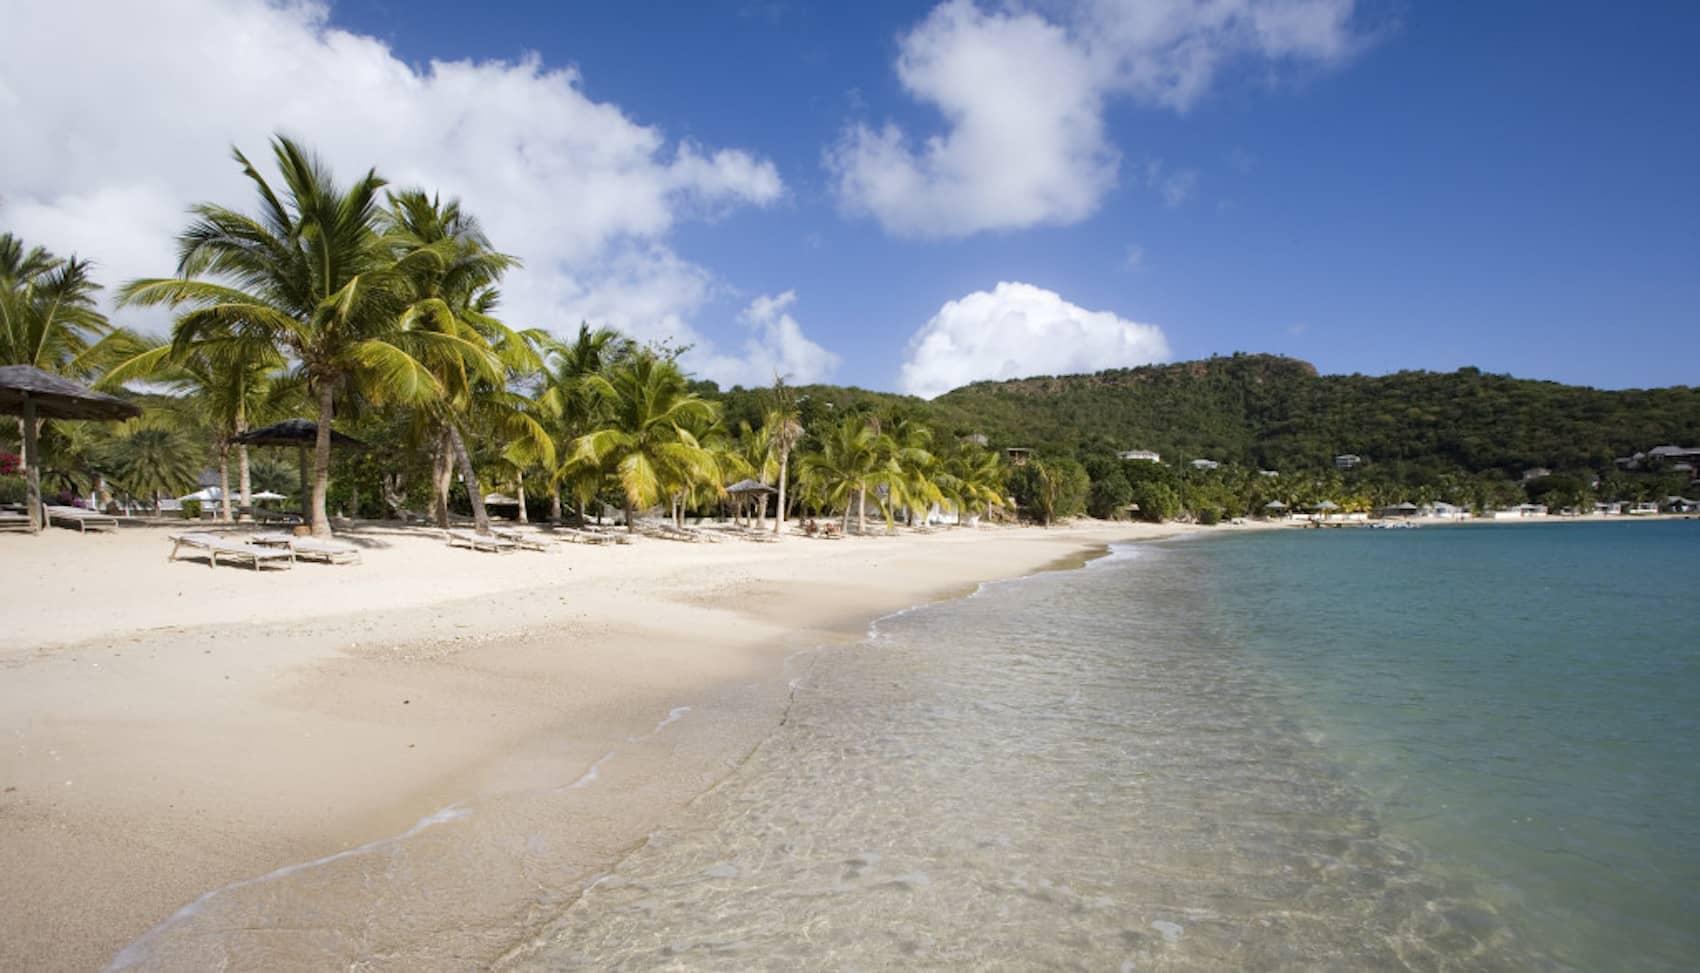 The inn at english harbour - Viaggio di nozze ai Caraibi